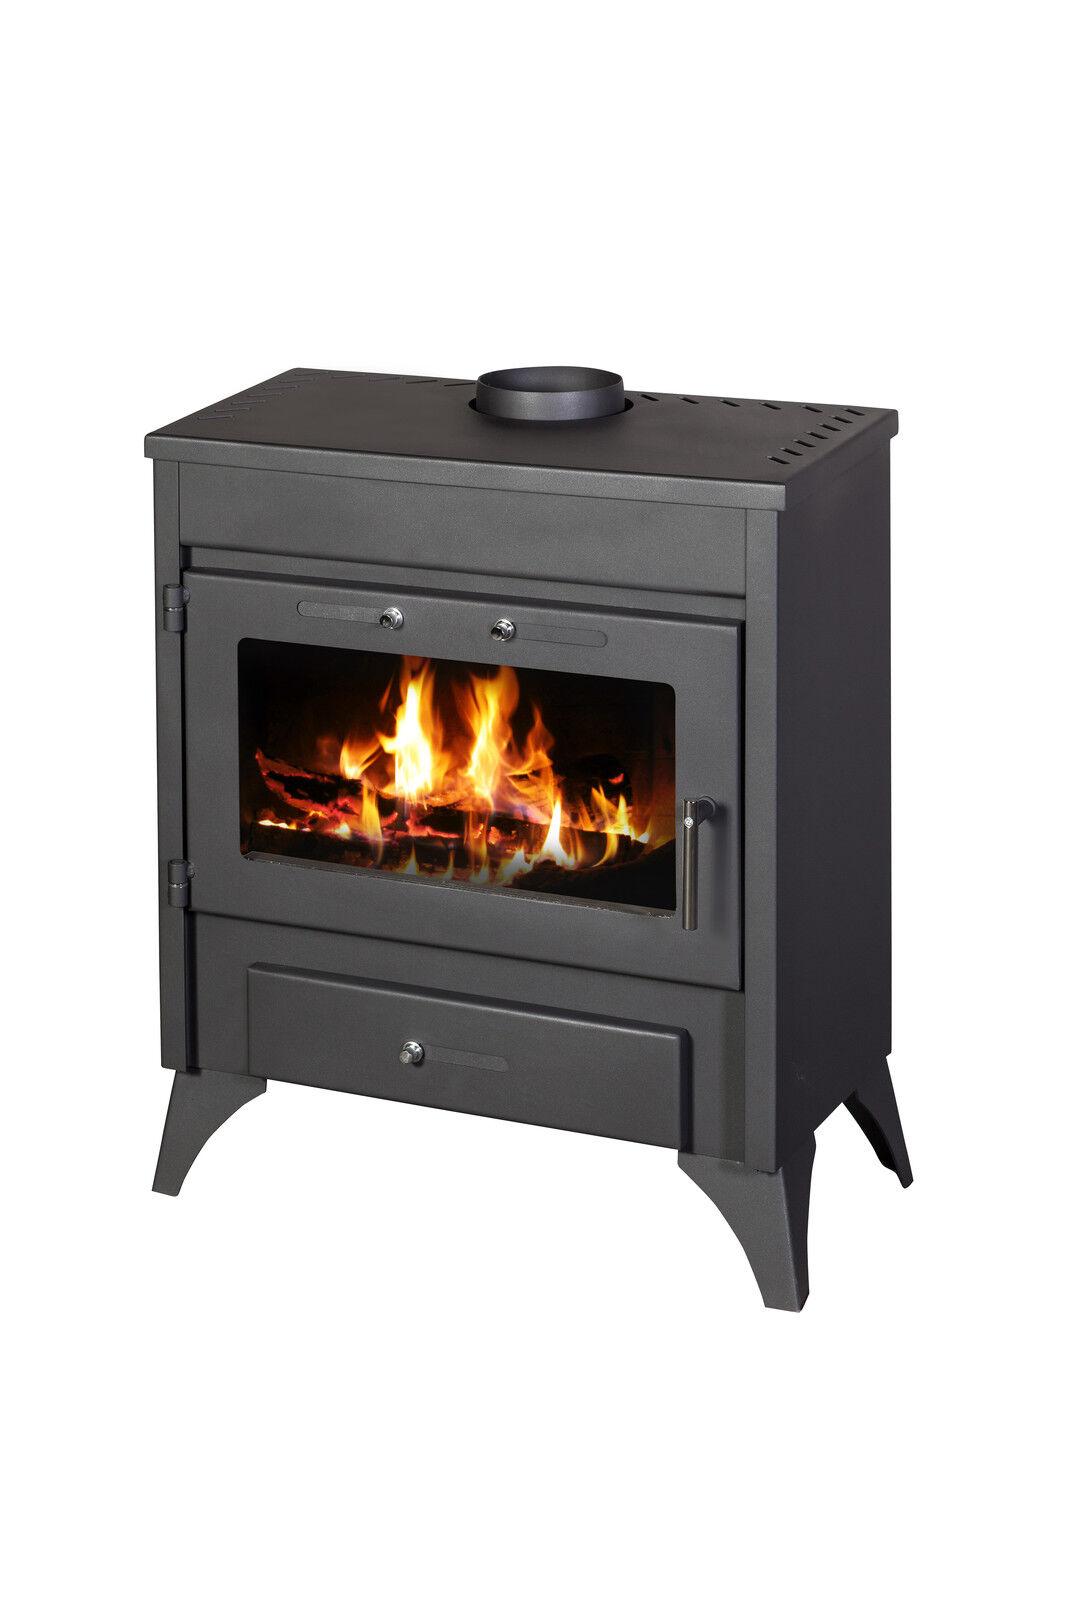 combustion du bois po le pour chauffage central chemin e arri re chaudi re ebay. Black Bedroom Furniture Sets. Home Design Ideas